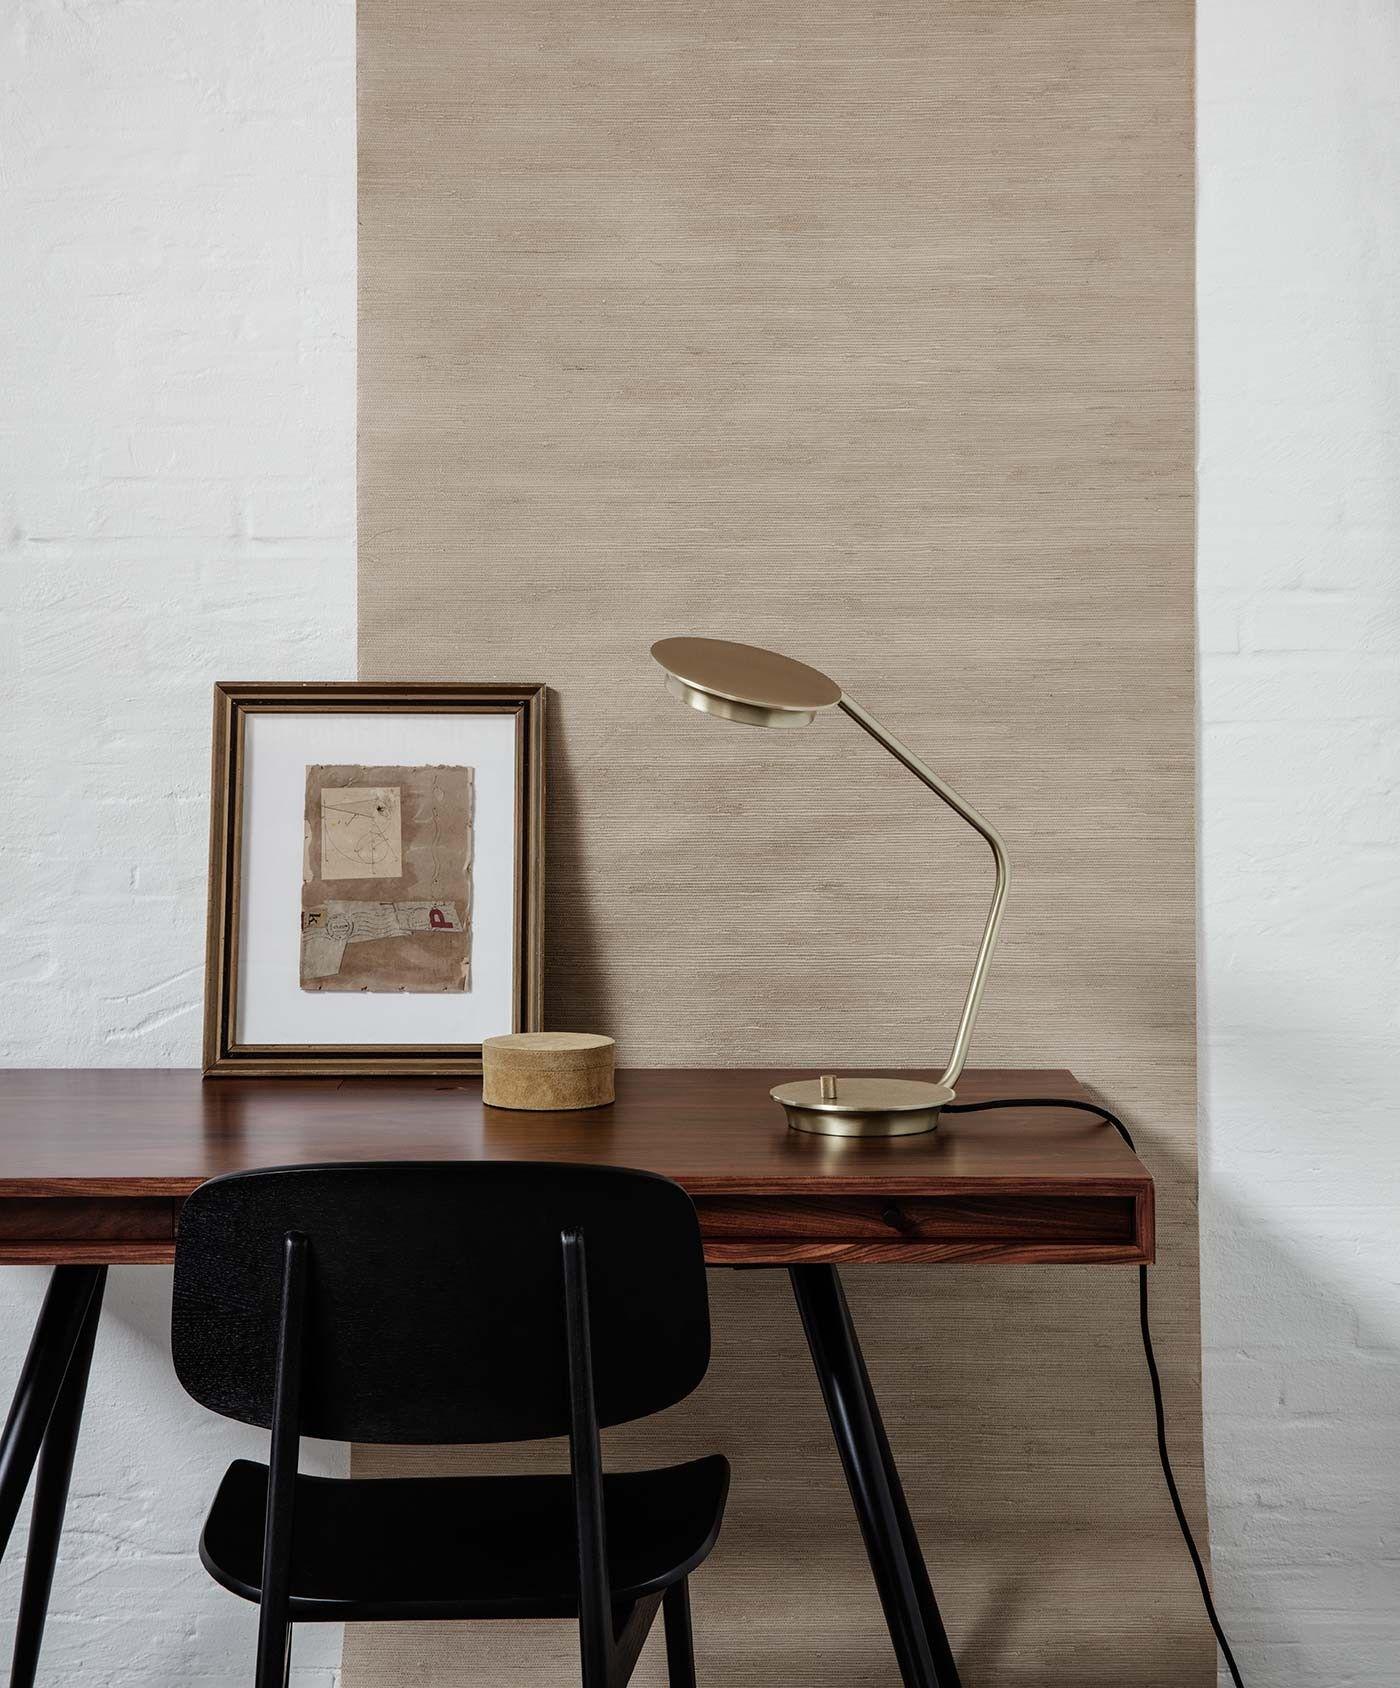 Bureau Scandinavisch Design.Norr11 Jfk Desk Bureau Home Office Bureau Jfk